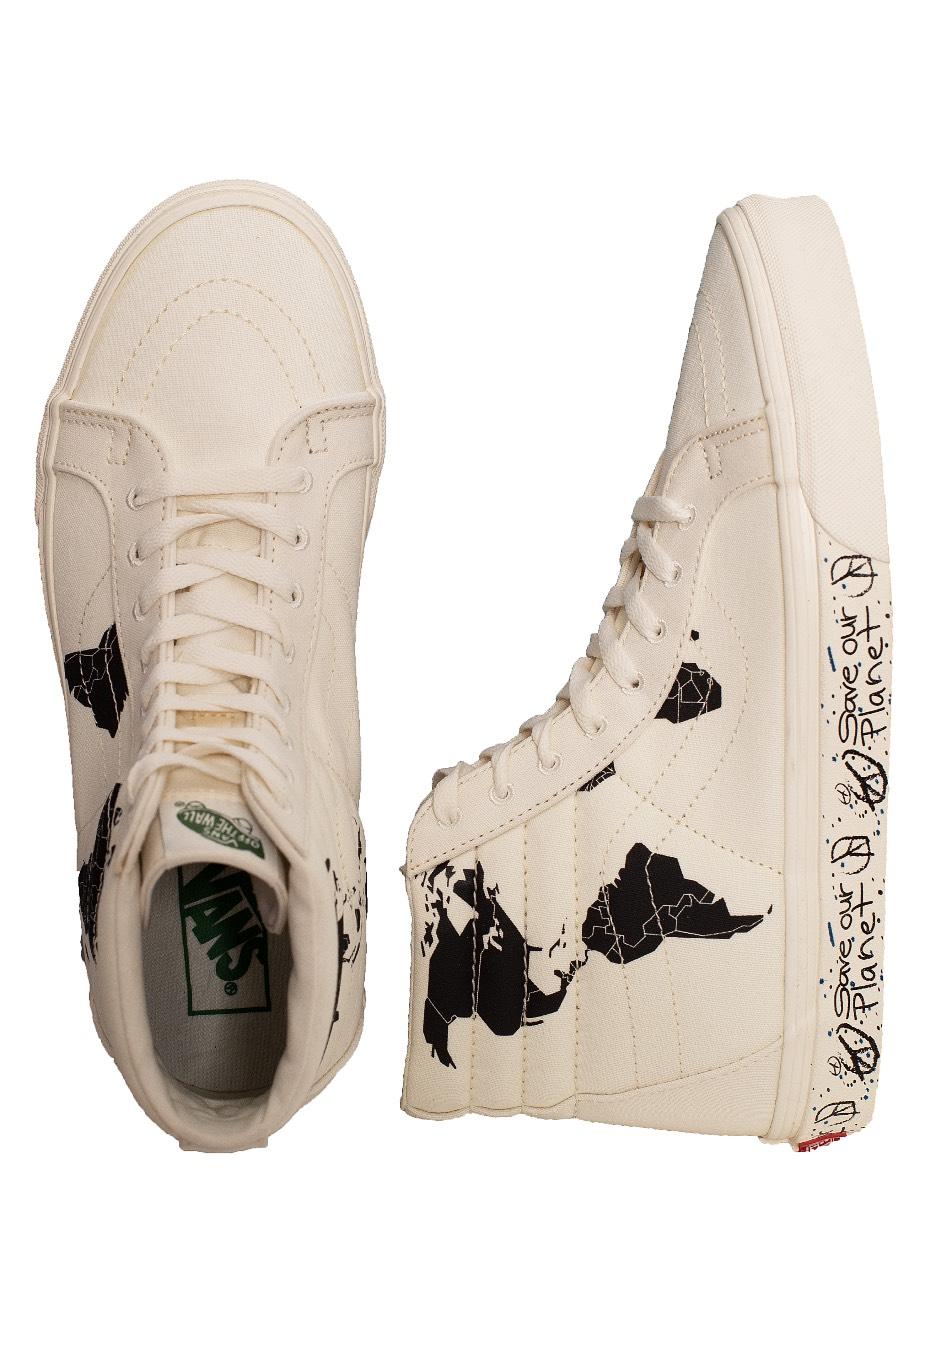 Vans Sk8 Hi Reissue Save Our Planet Classic WhiteBlack Chaussures